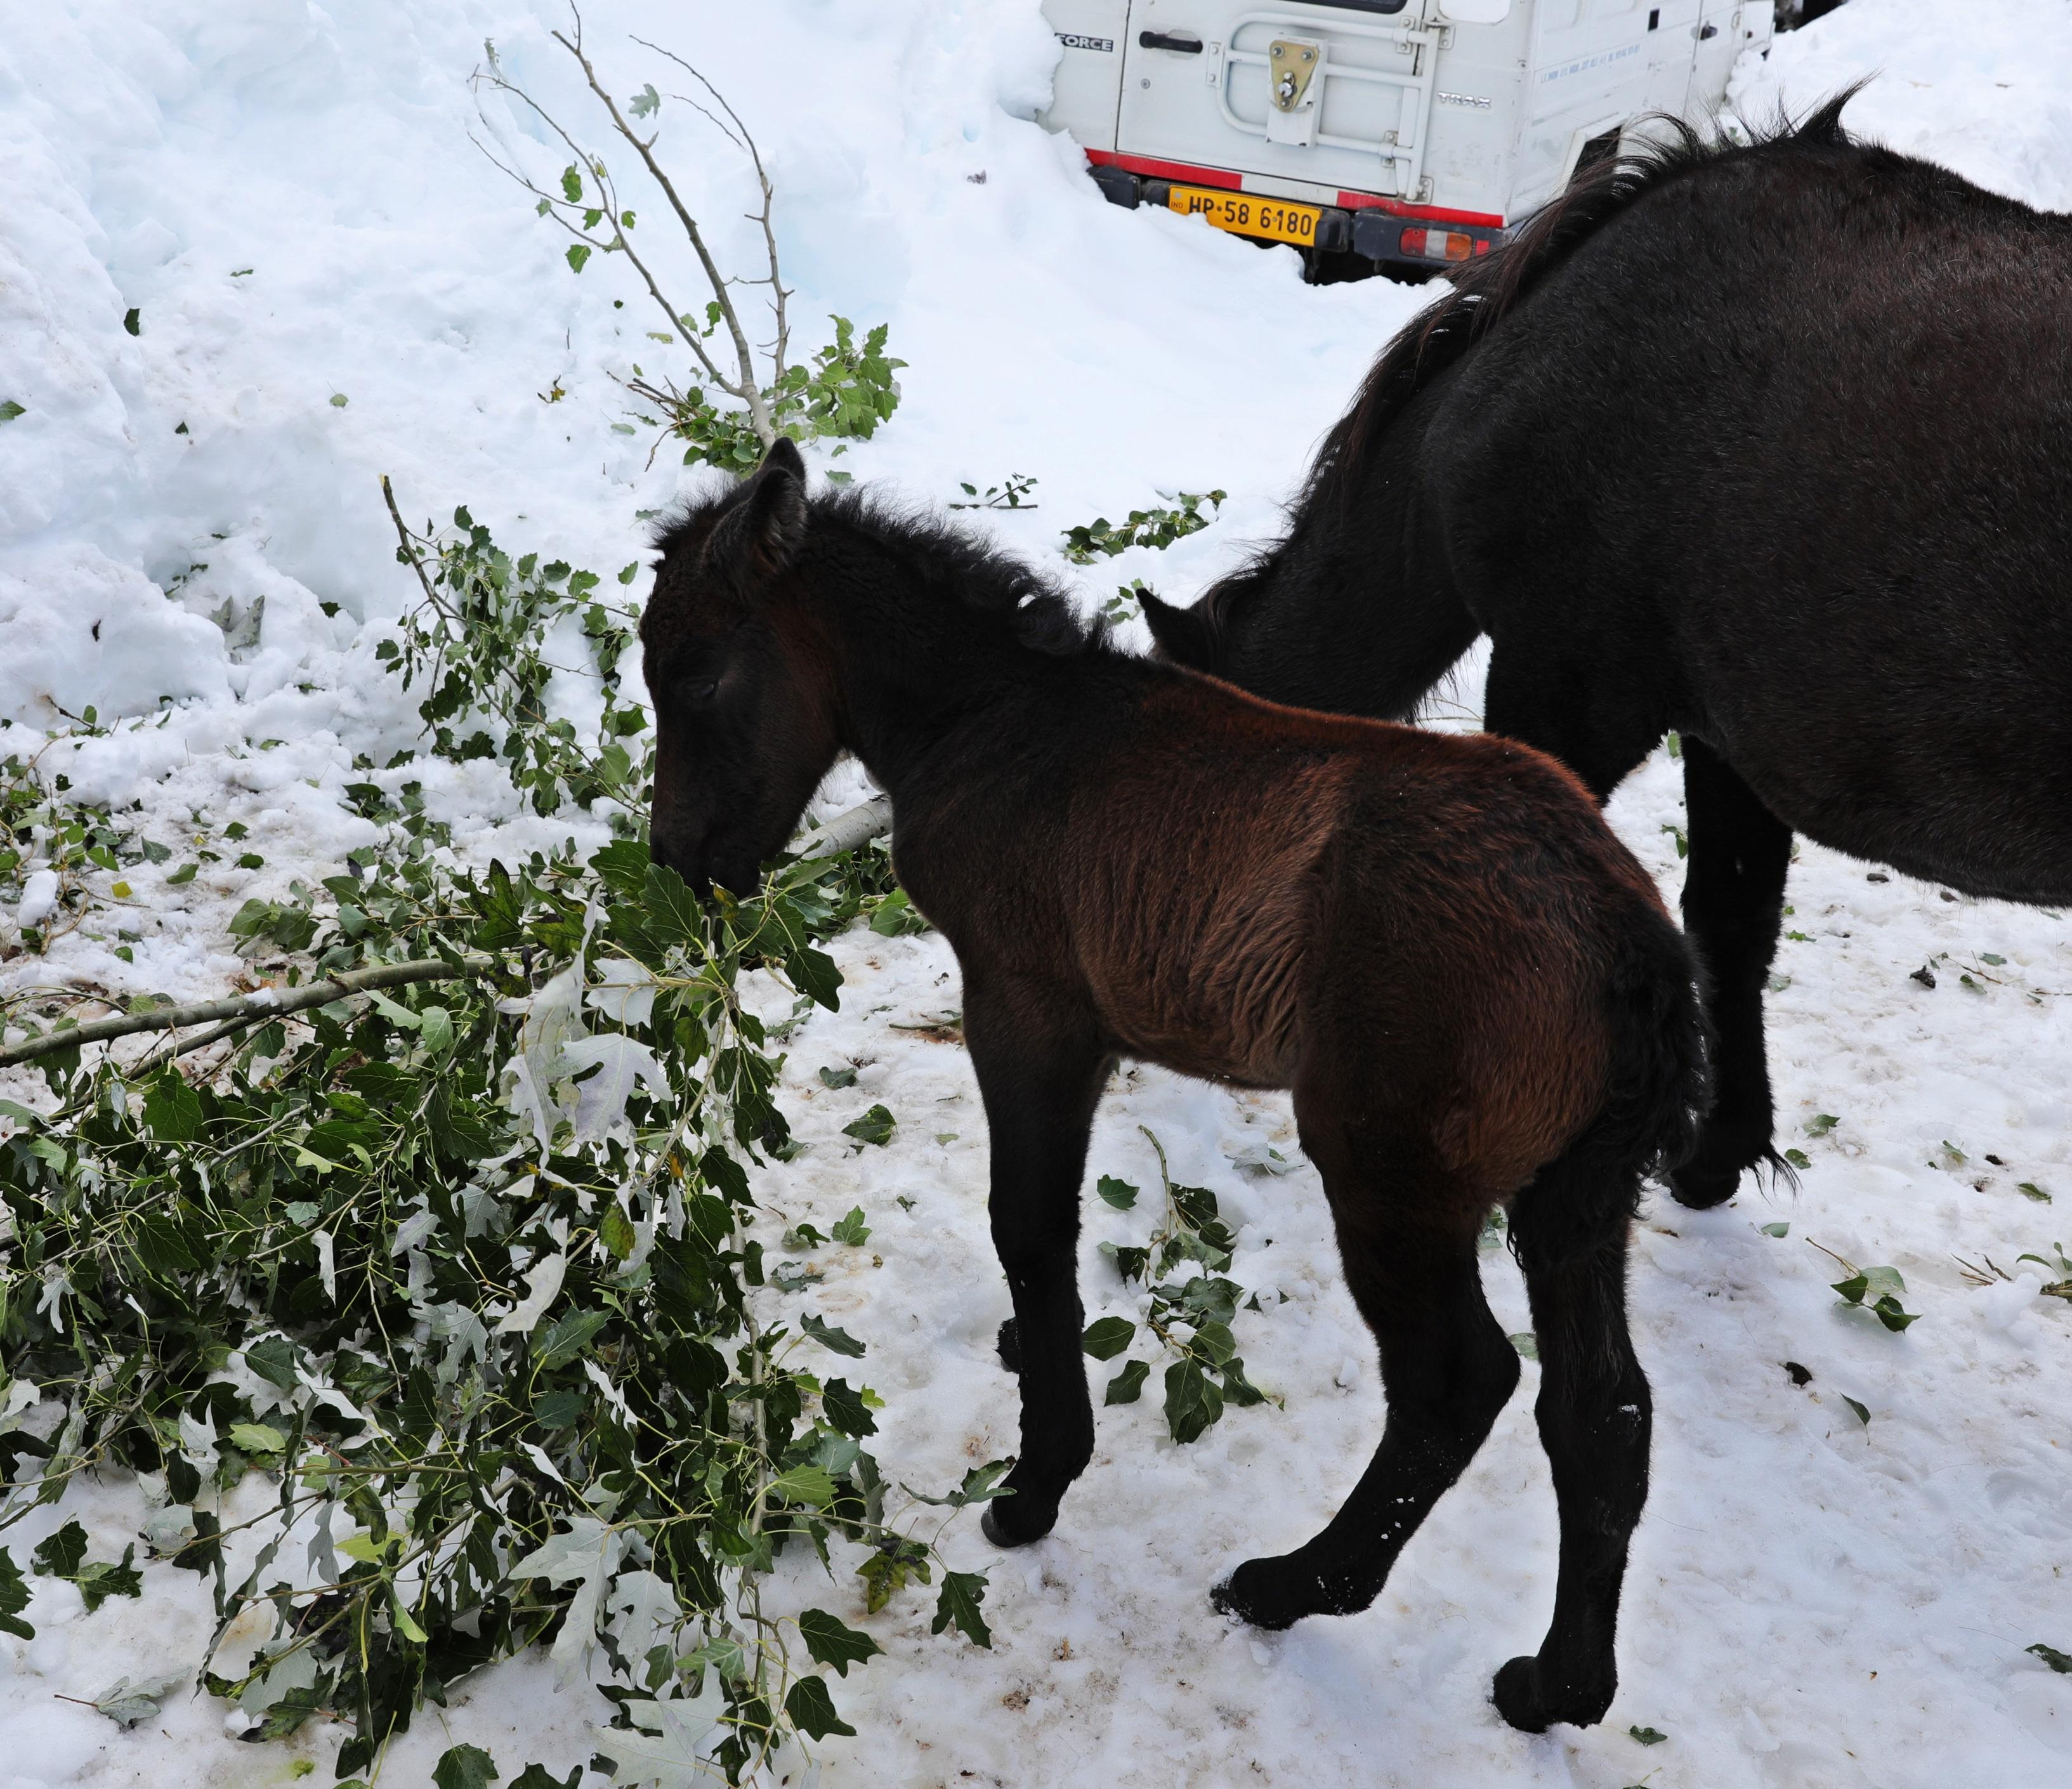 Horses feeding on tree branches